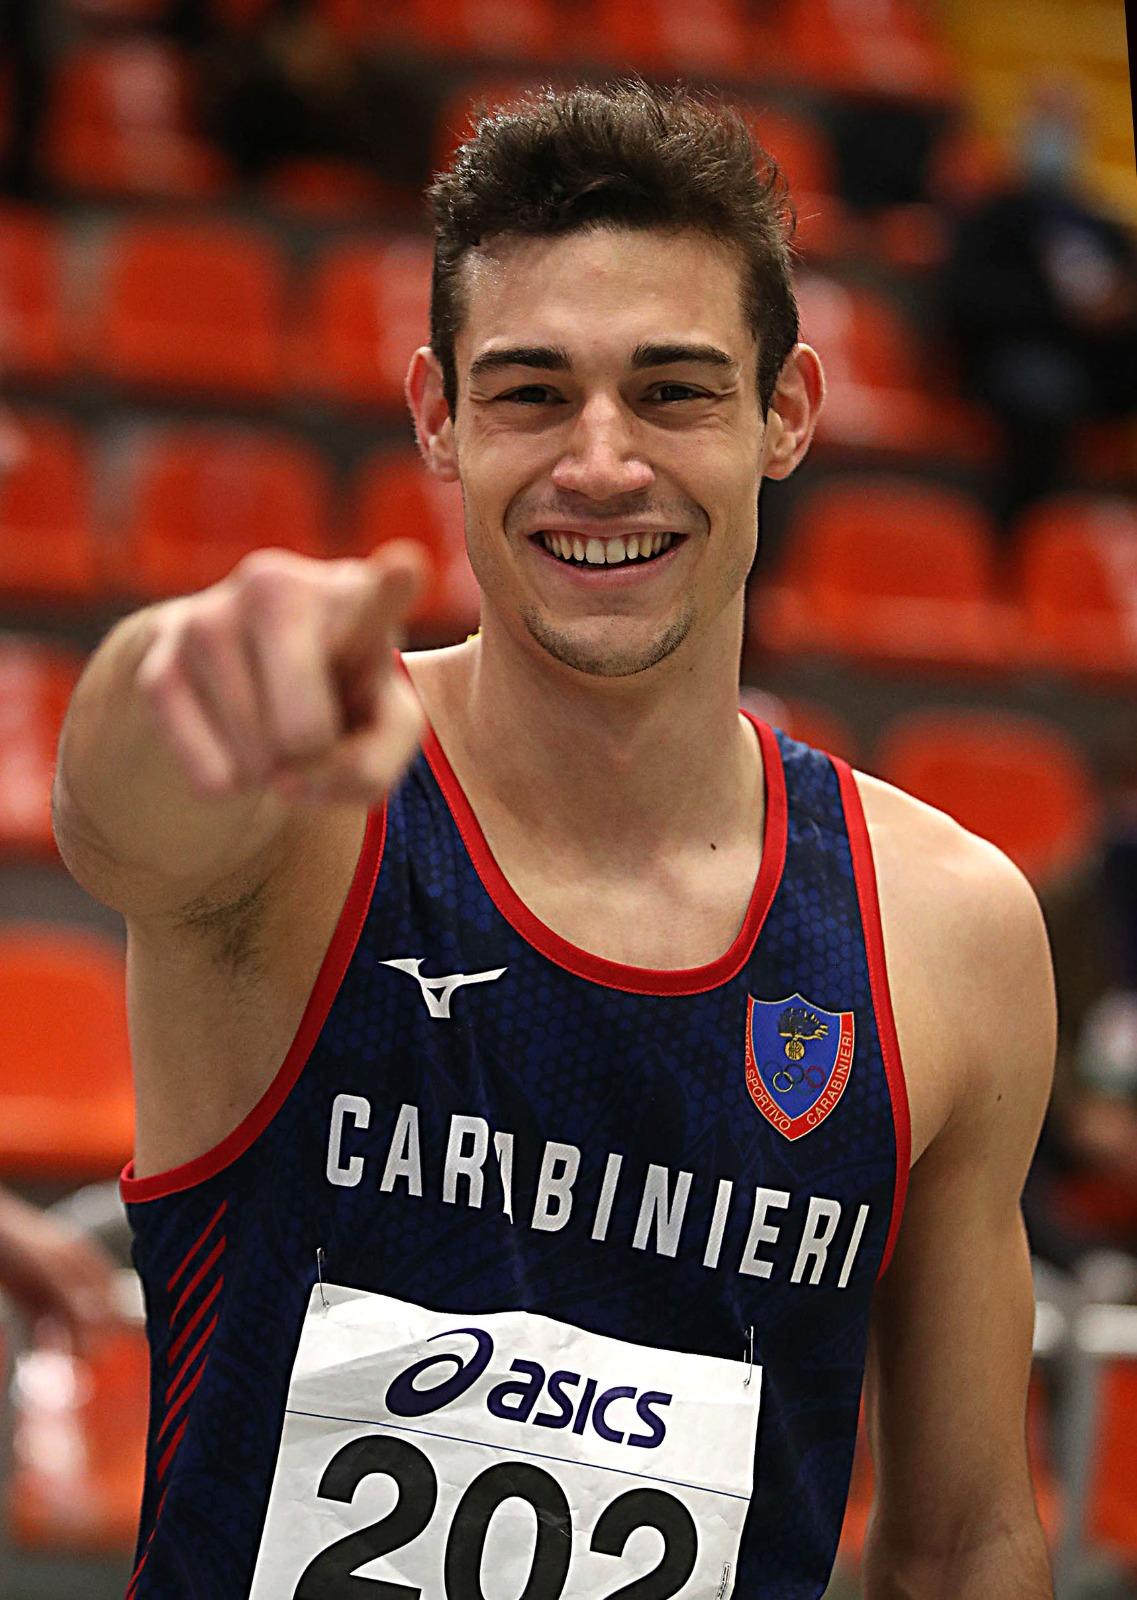 Dario Dester Indoor Champ for Eptathlon: new national record 6.076 pt